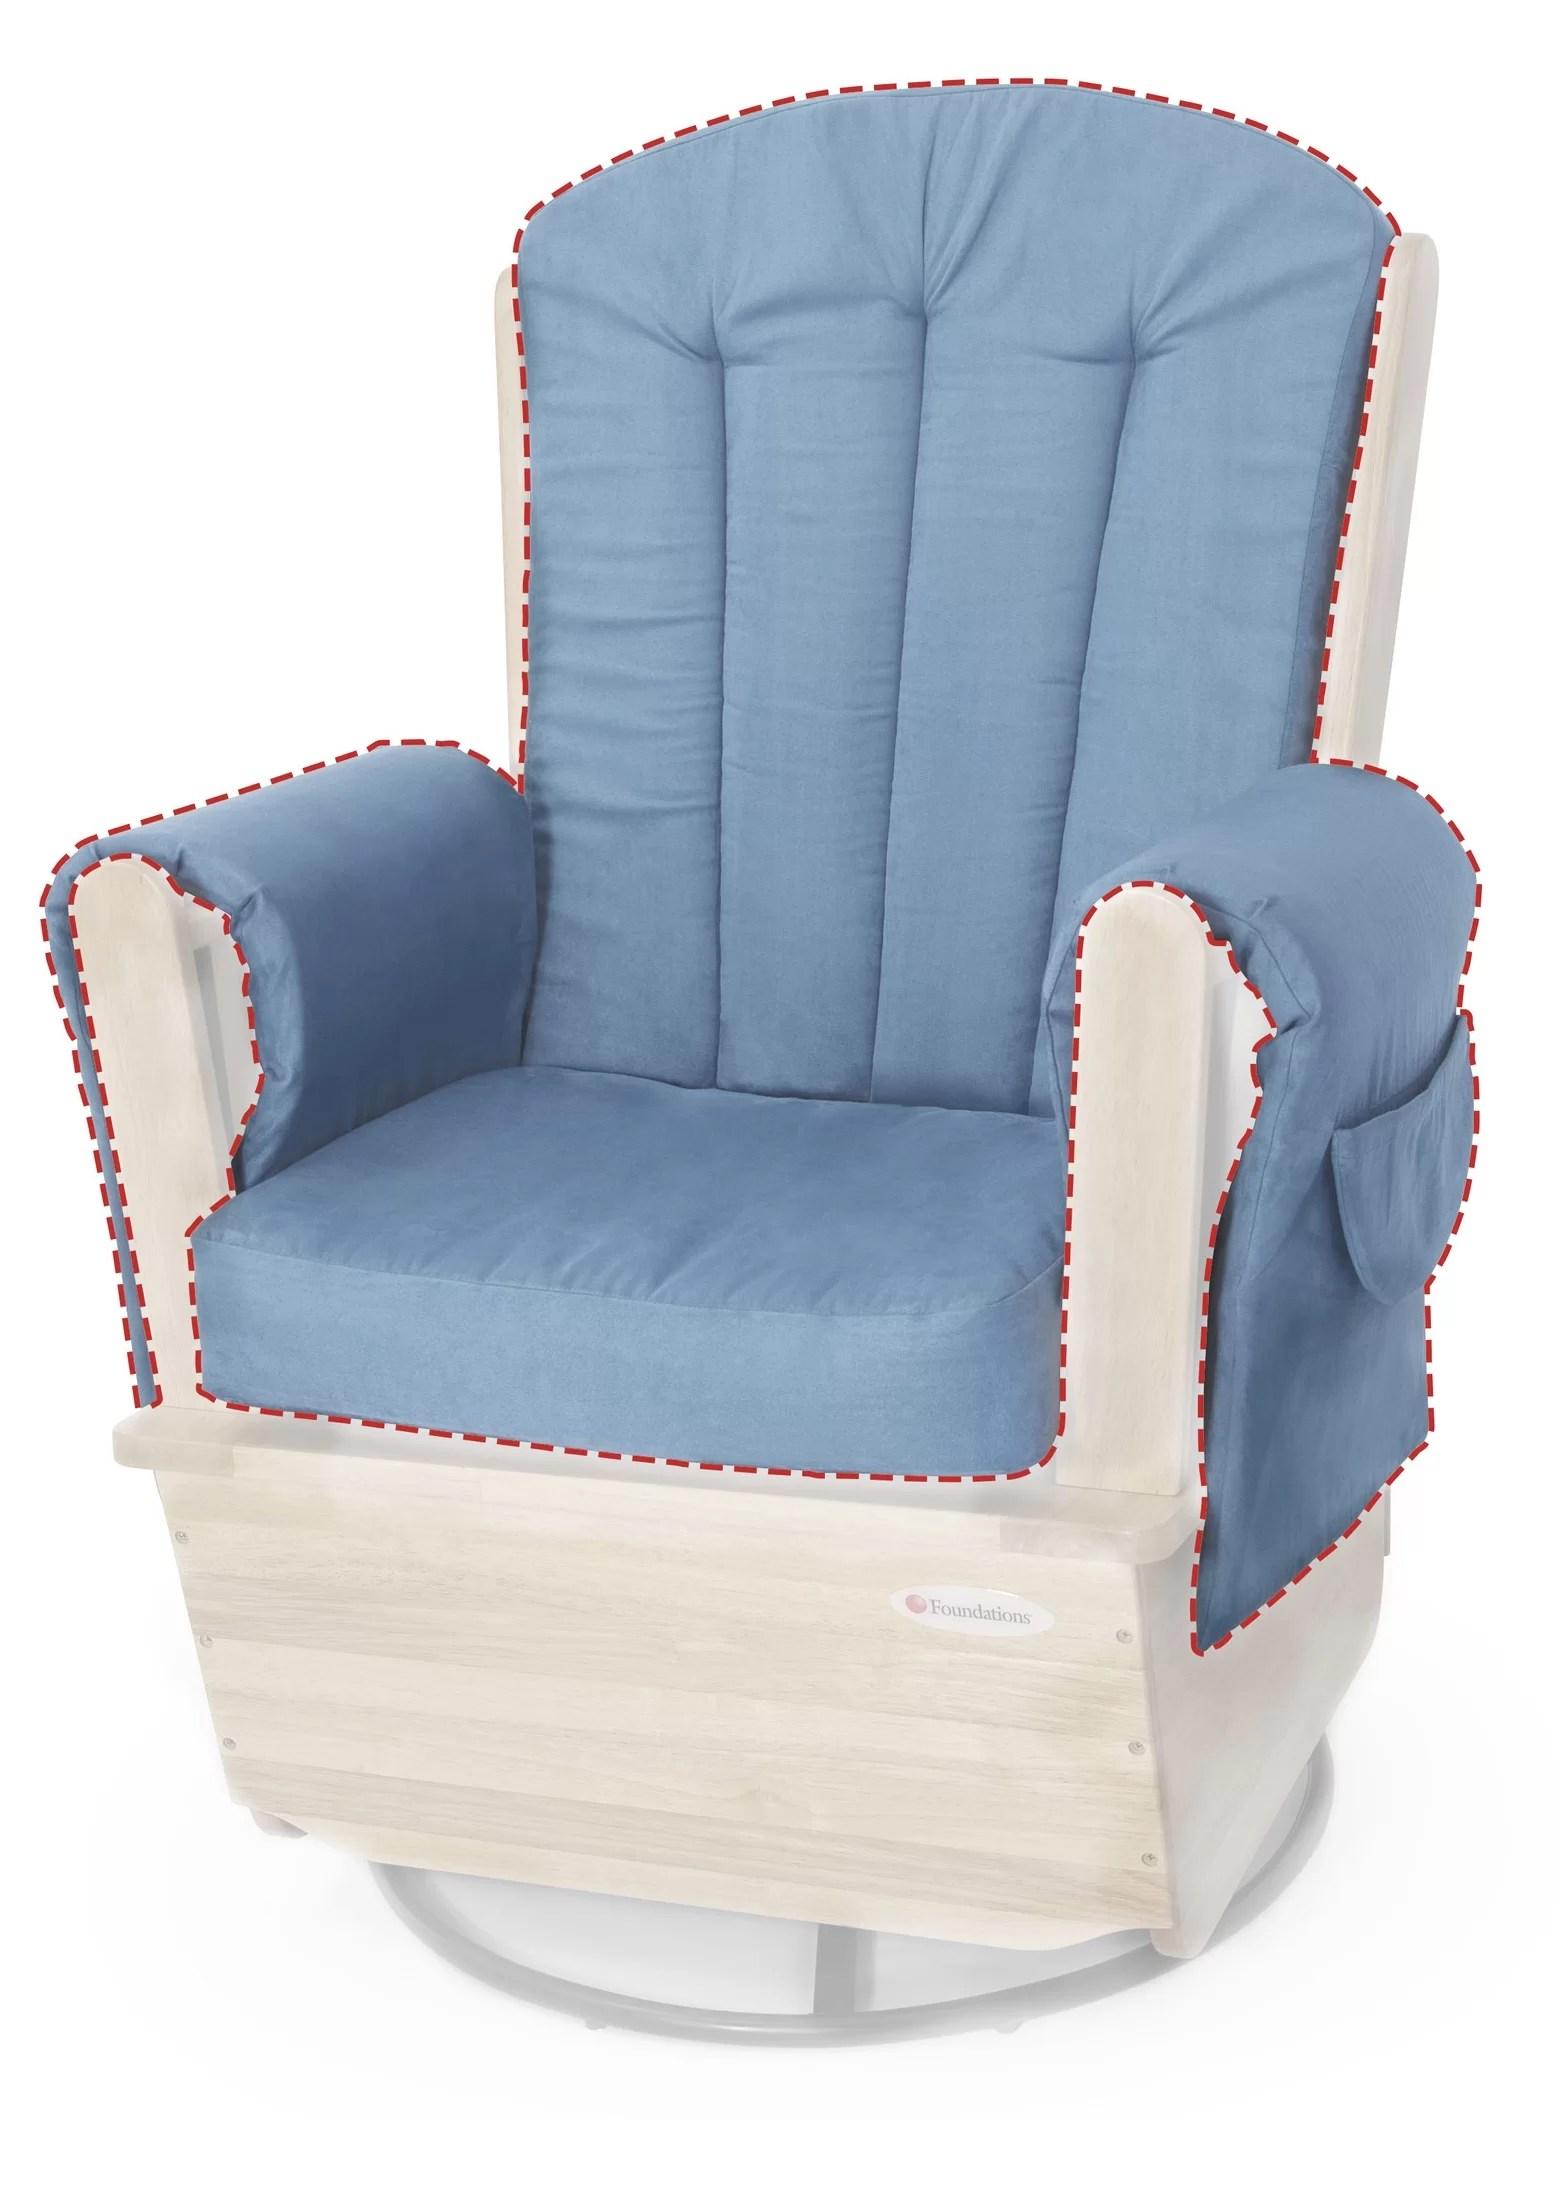 saferocker replacement indoor rocking chair cushion